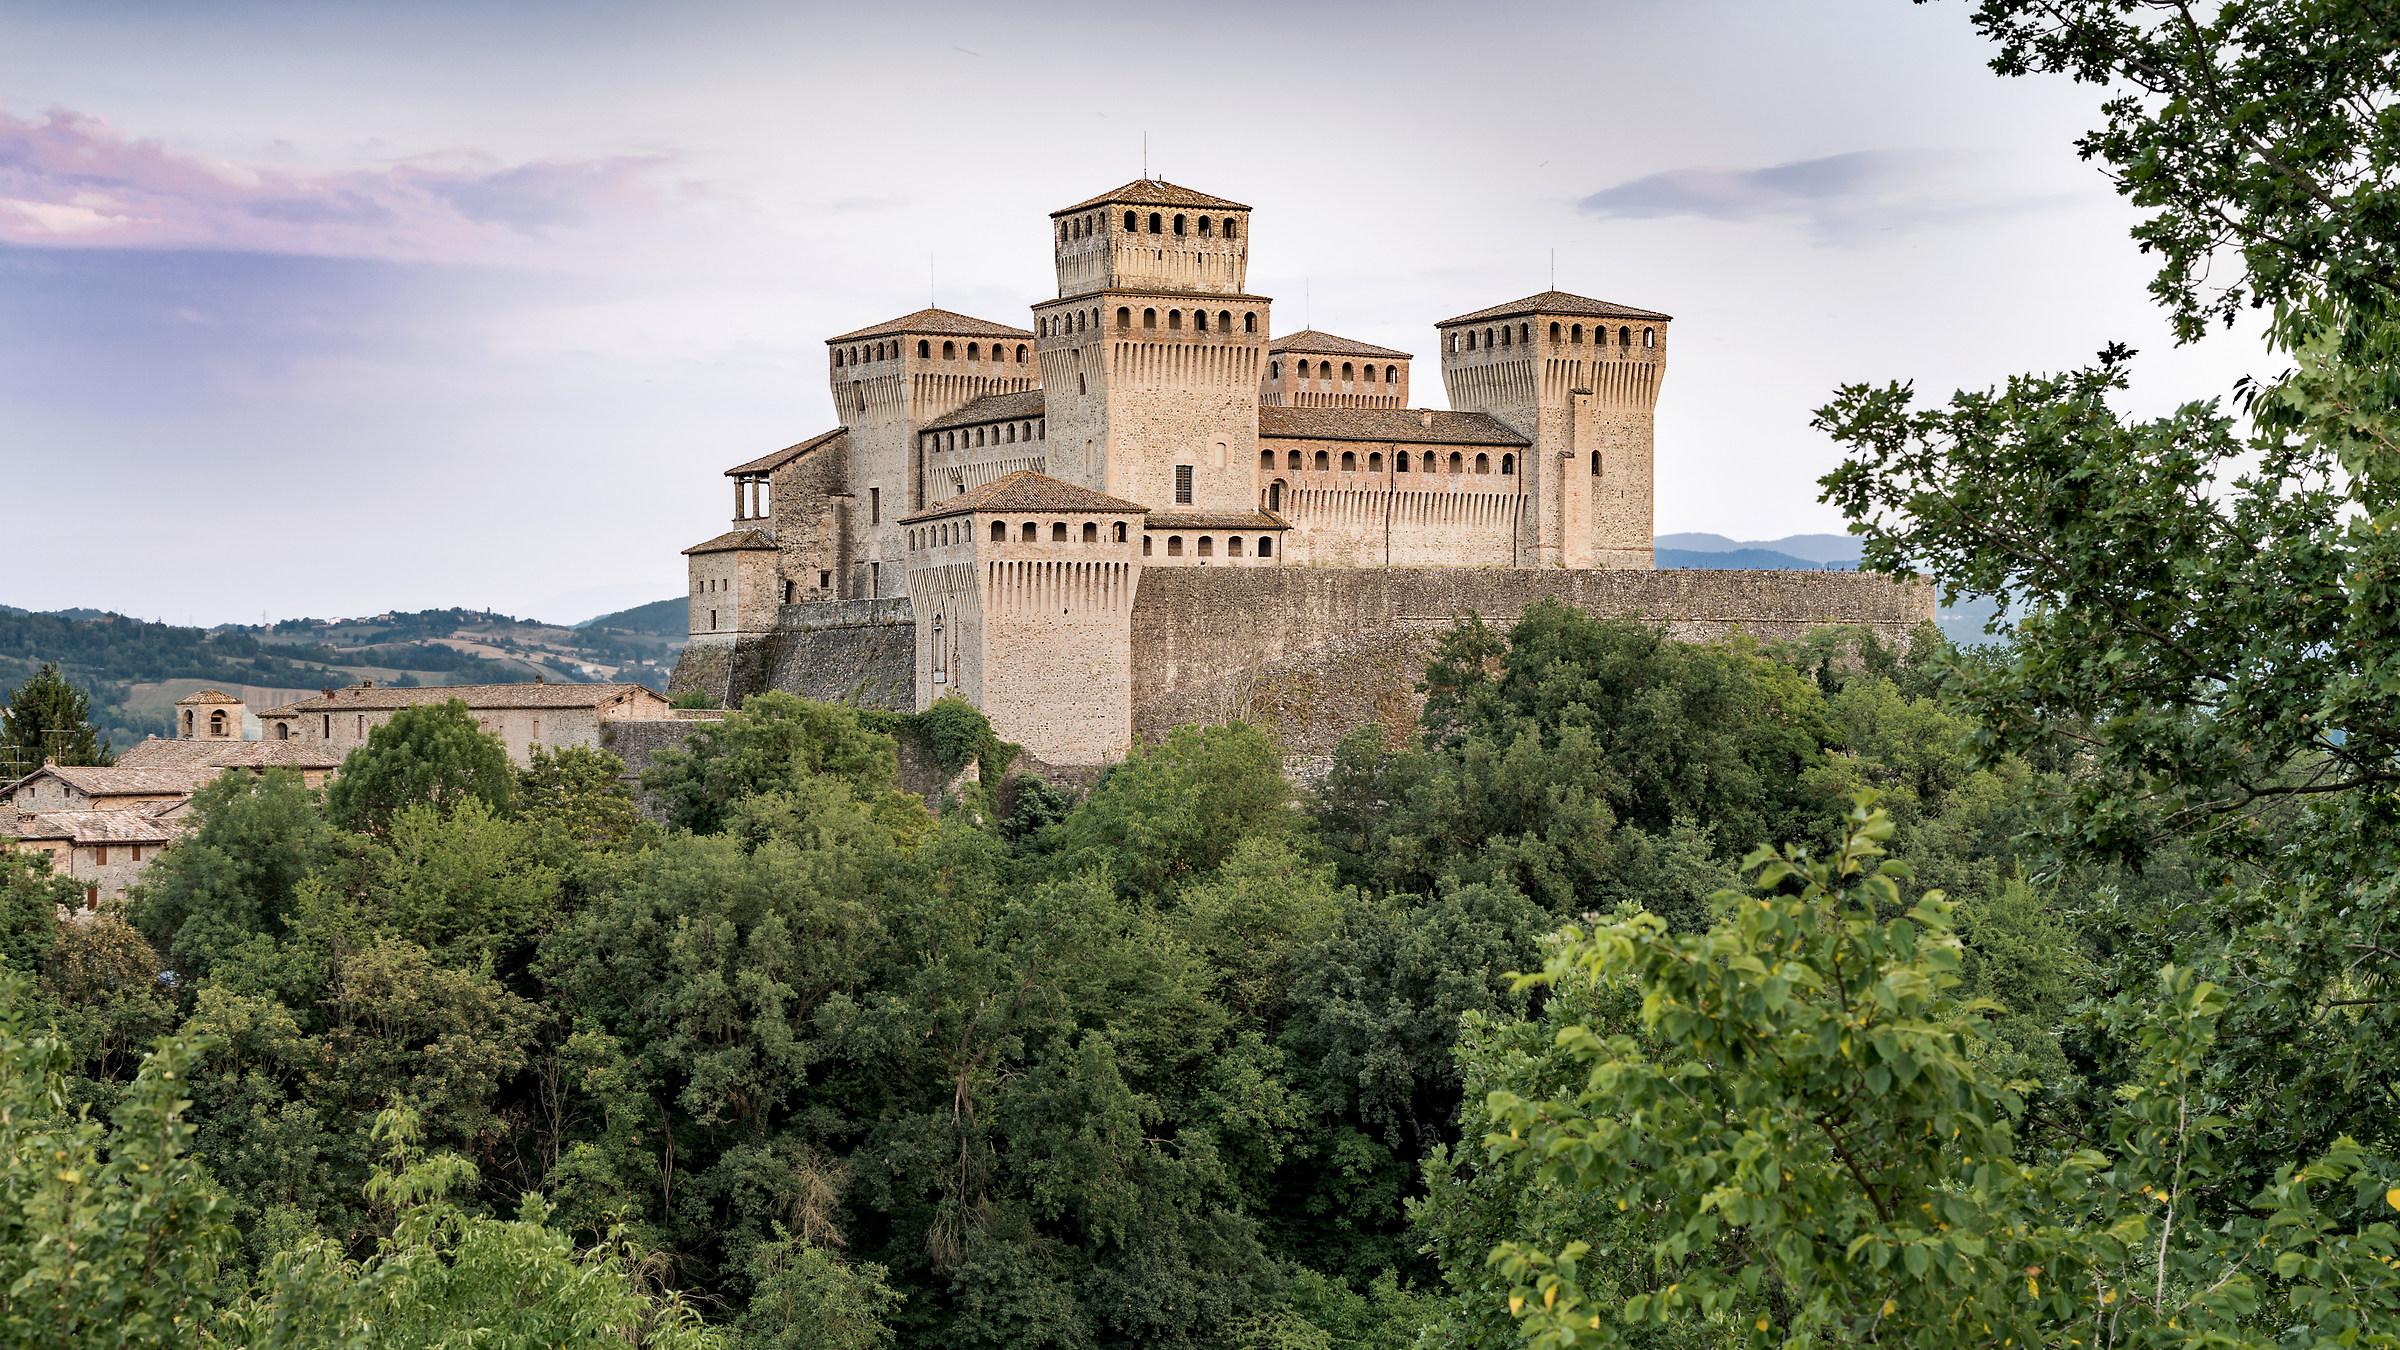 Torrechiara (Parma)...